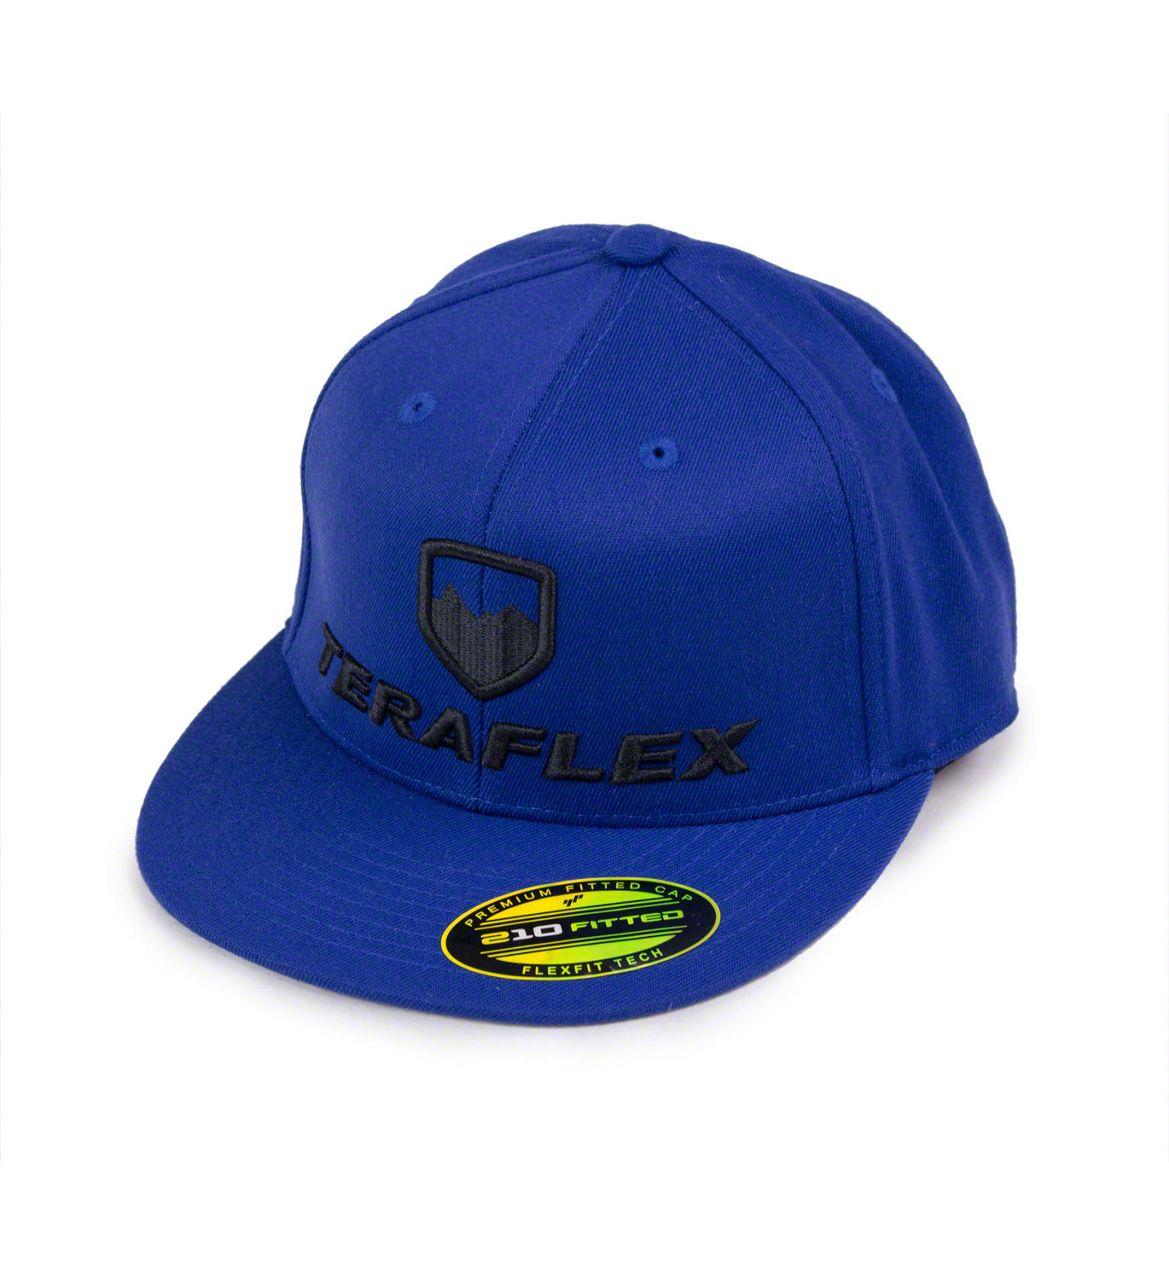 Teraflex Premium FlexFit Flat Visor Hat - Royal Blue